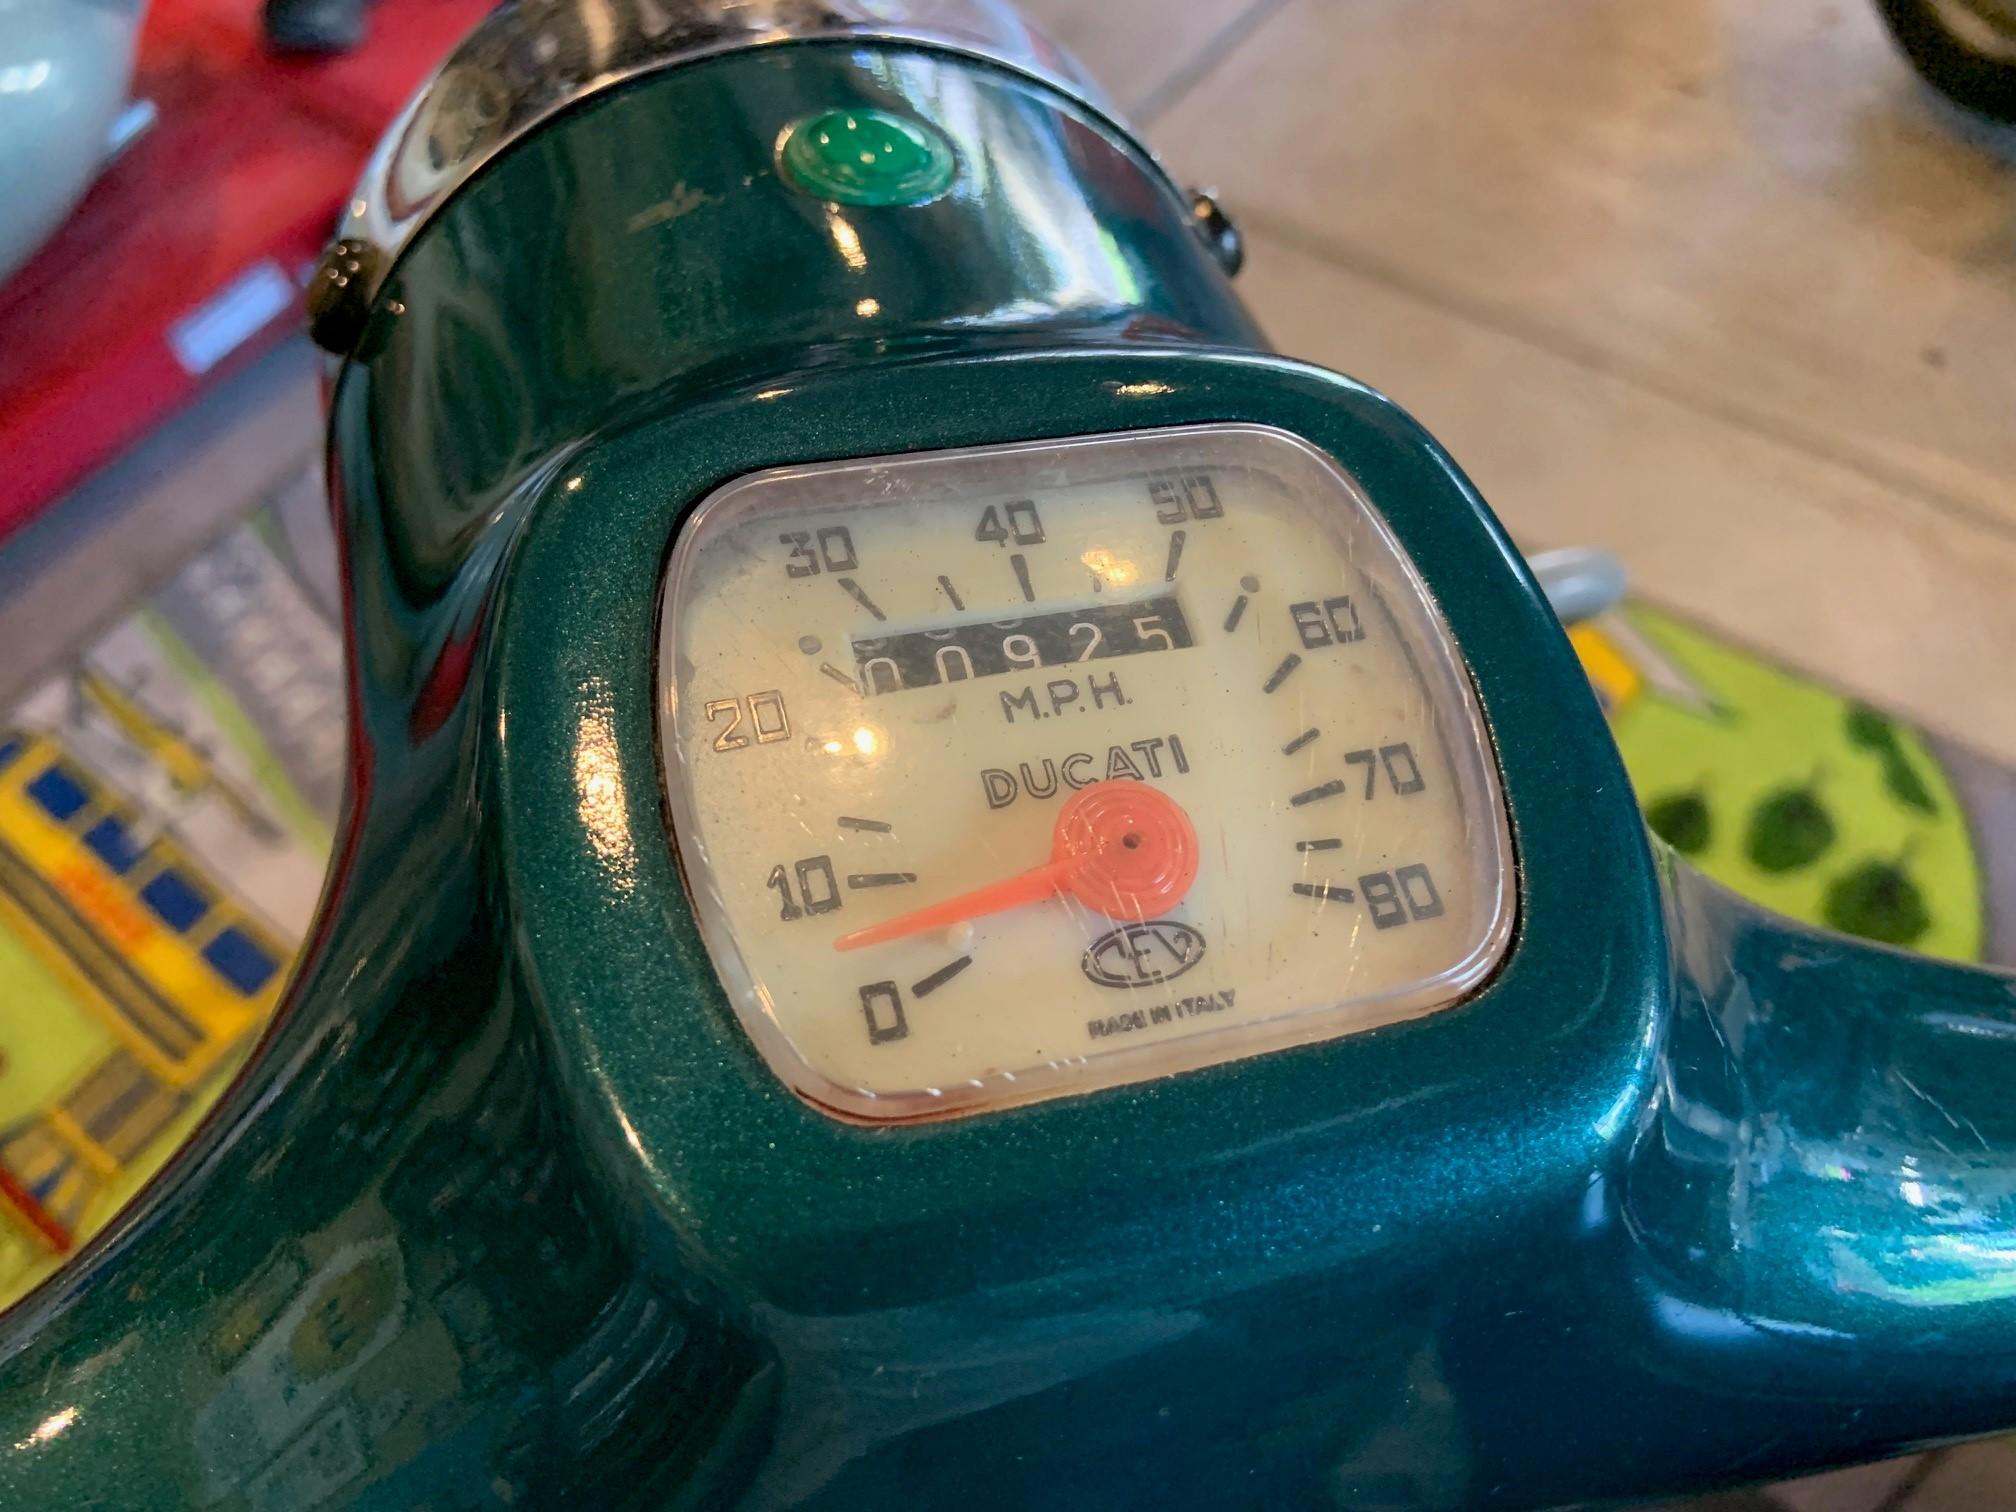 Josh Rogers - 1966 Ducati Brio 100 - speedometer